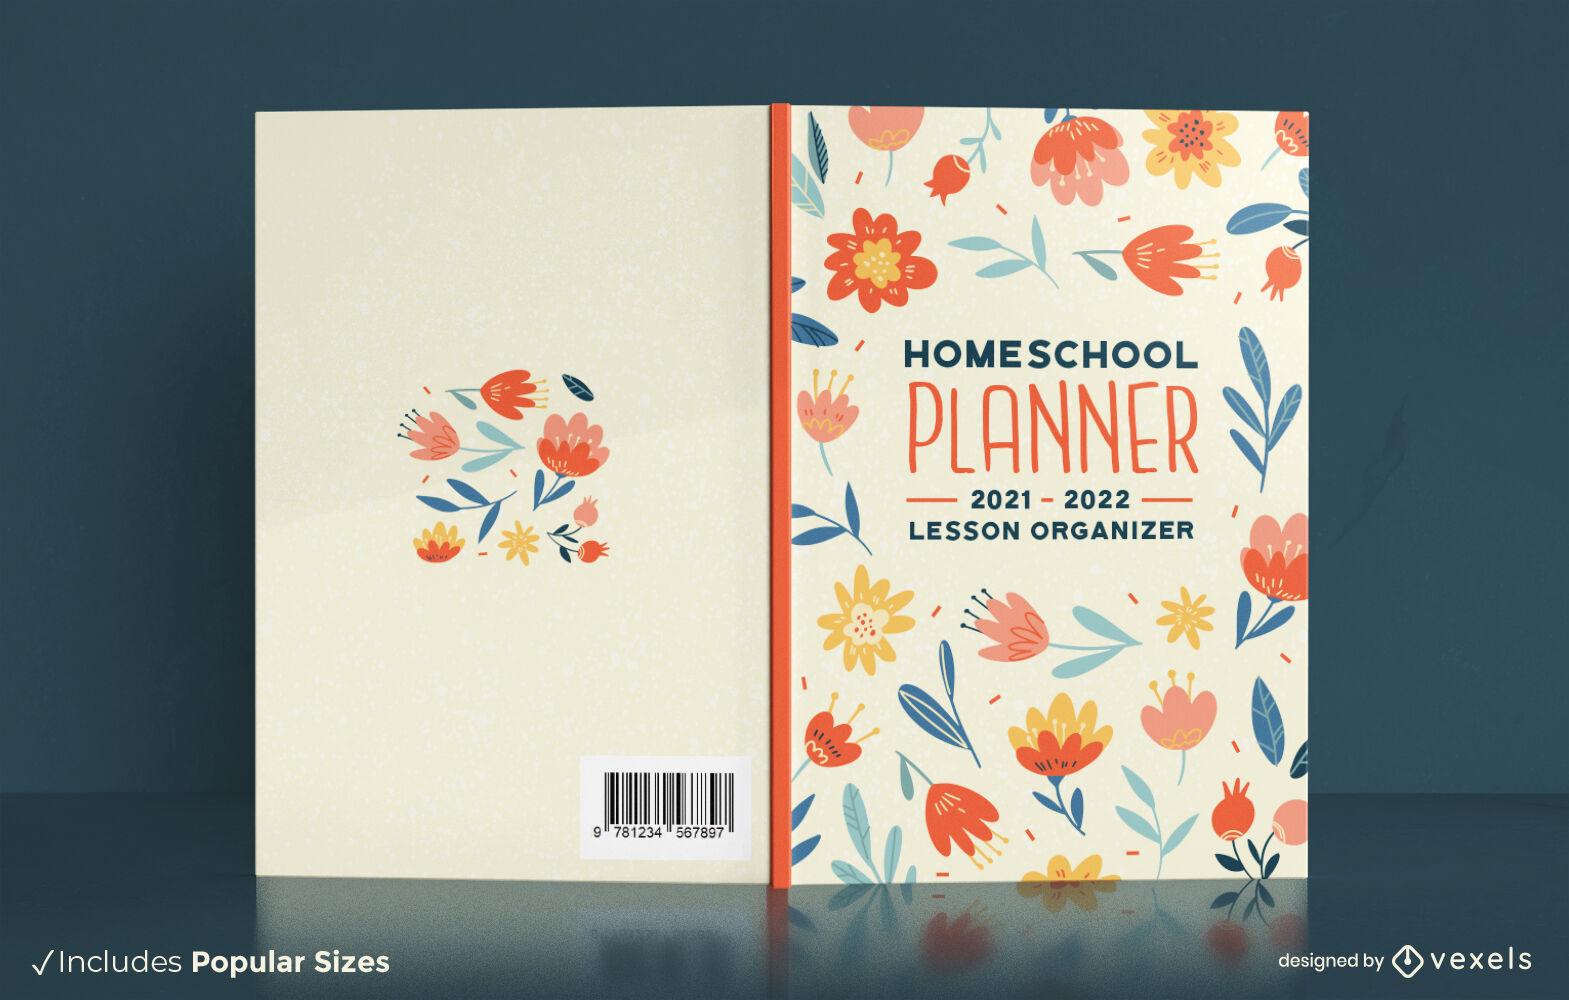 Floral homeschool planner book cover design